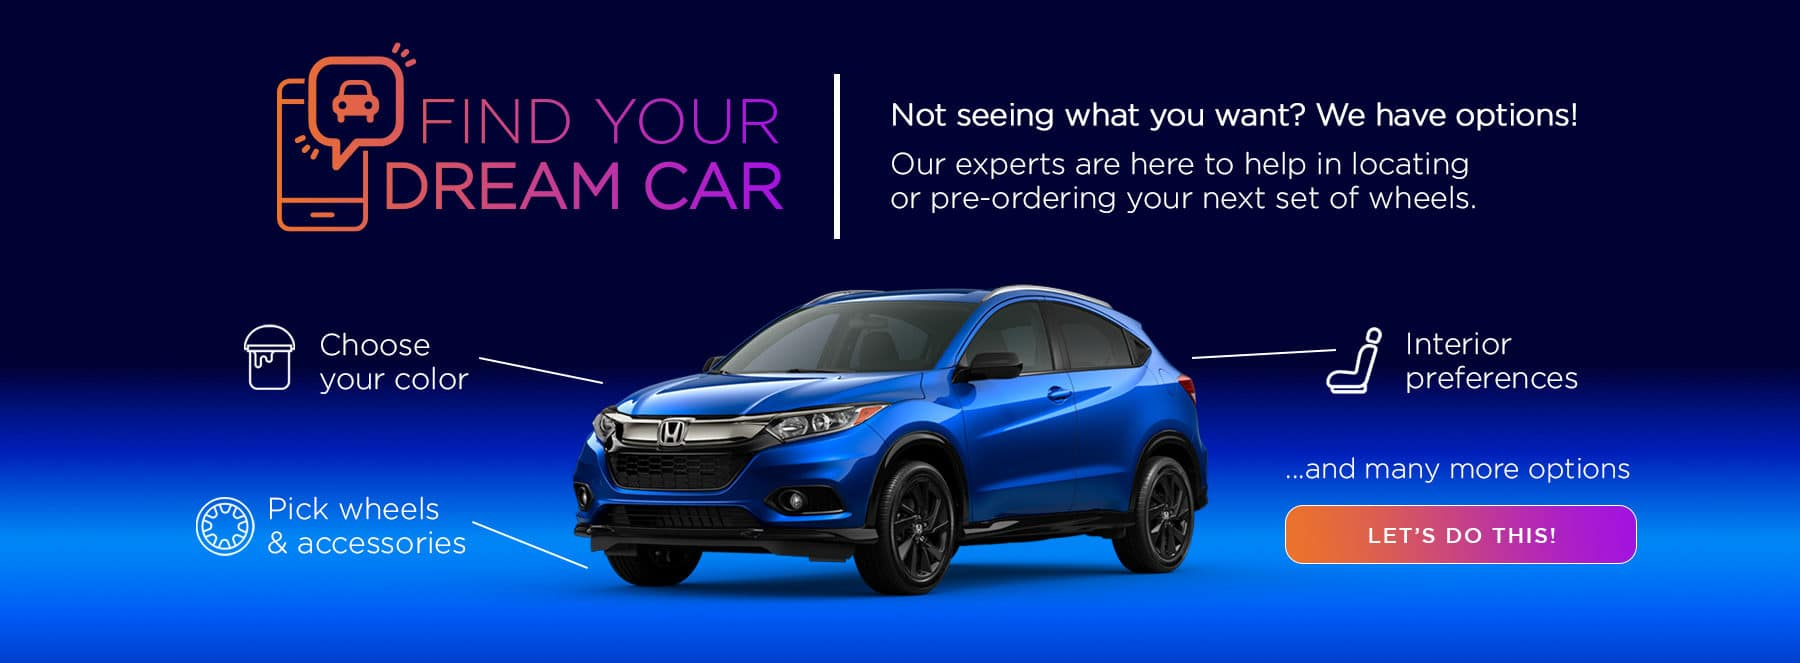 Holman Honda Pre-order Dream Car